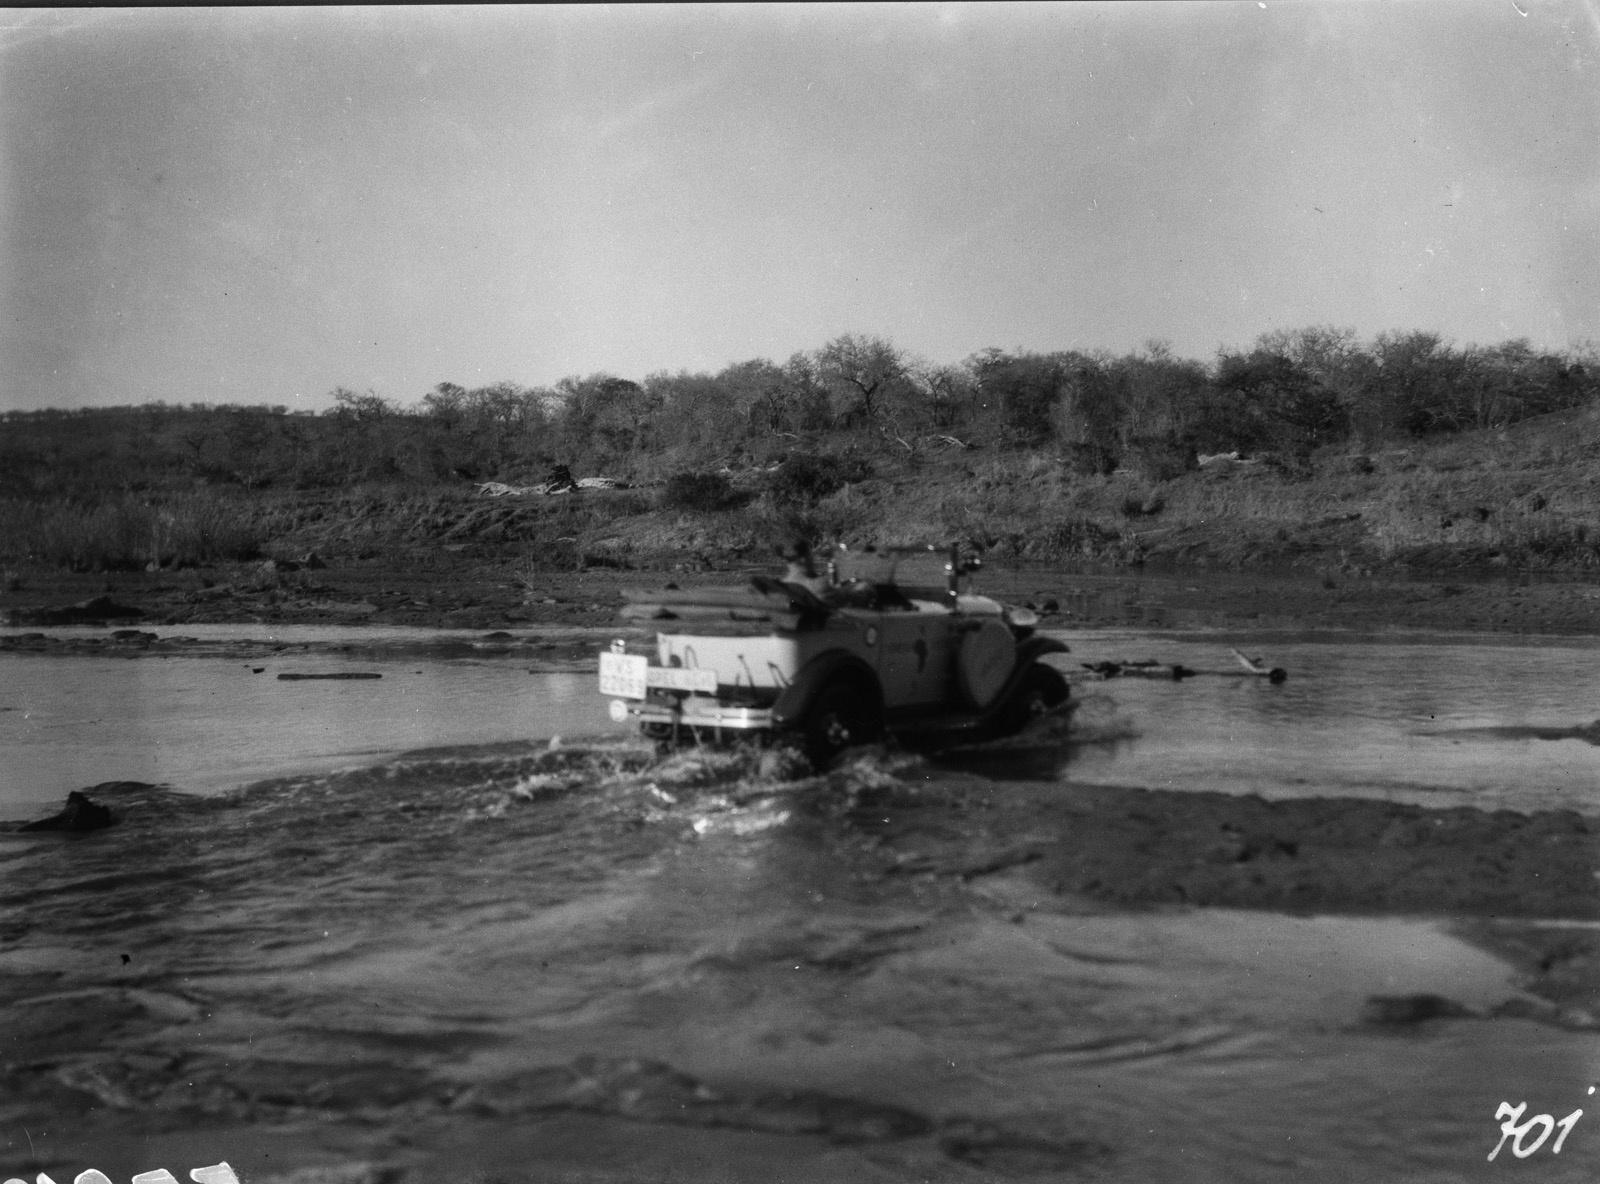 Национальный парк Крюгера. Ford на мелководье